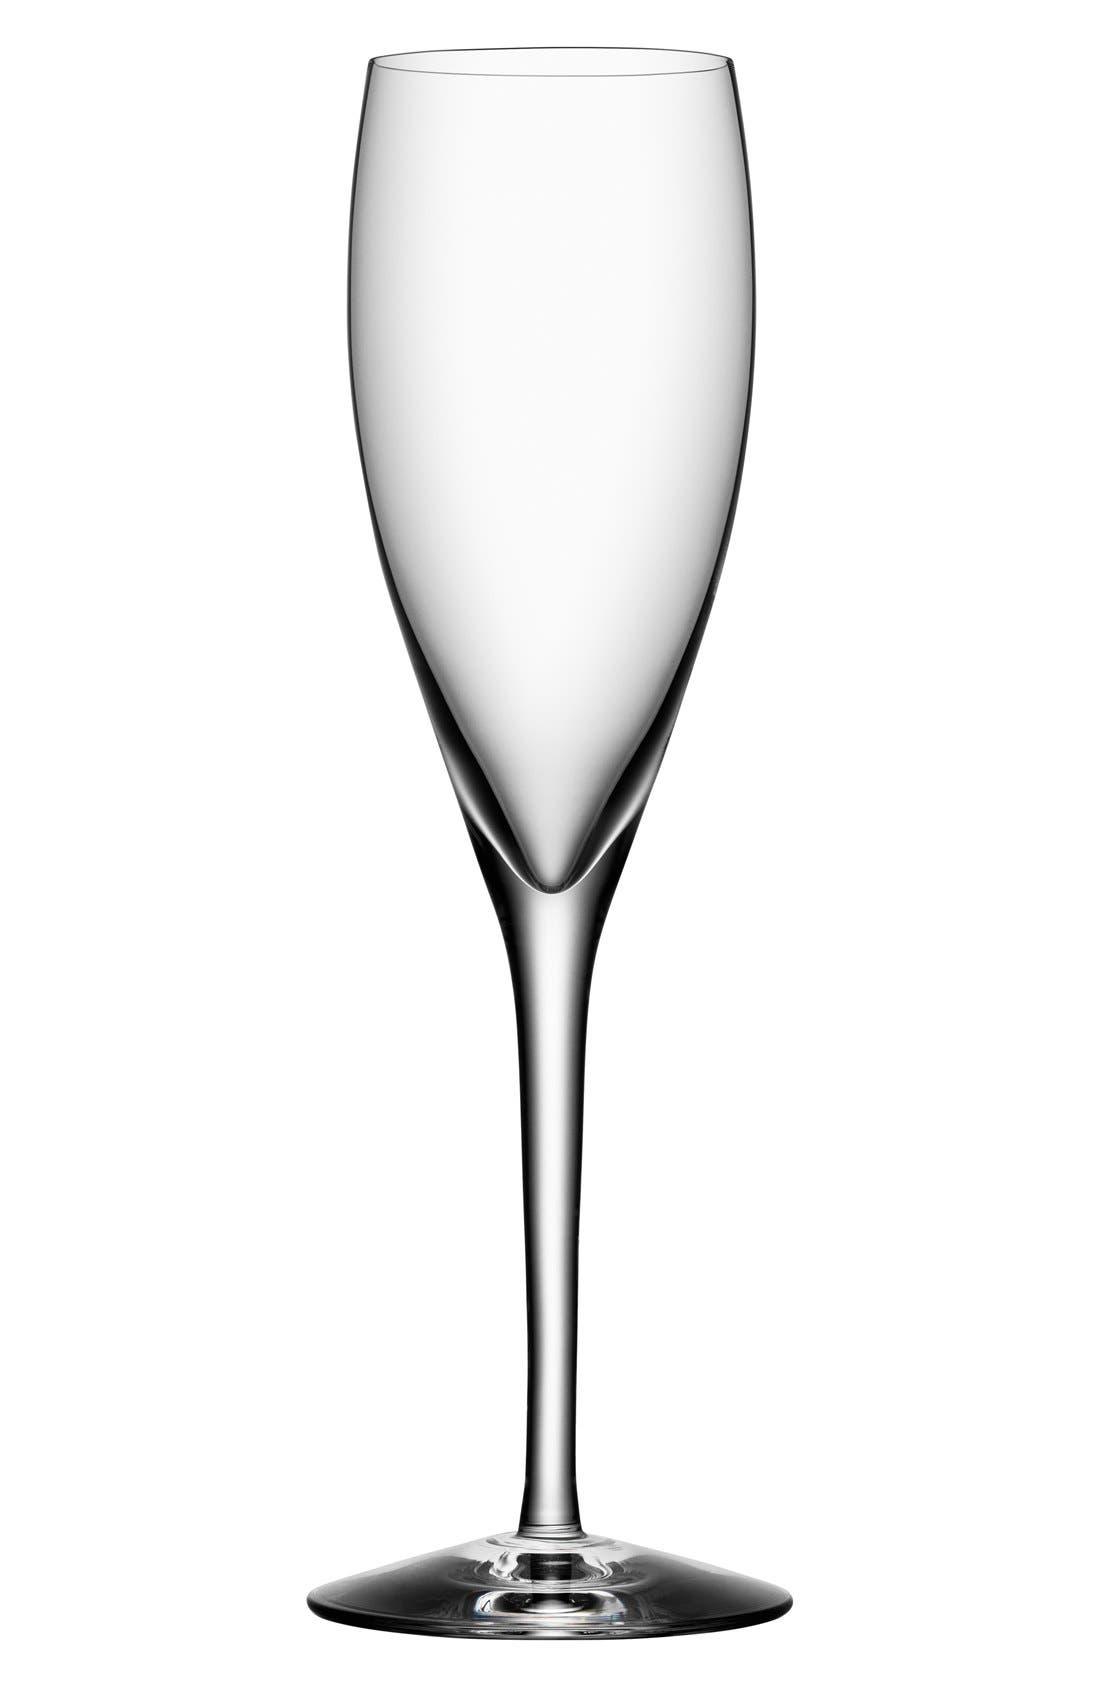 ORREFORS 'More' Champagne Flutes